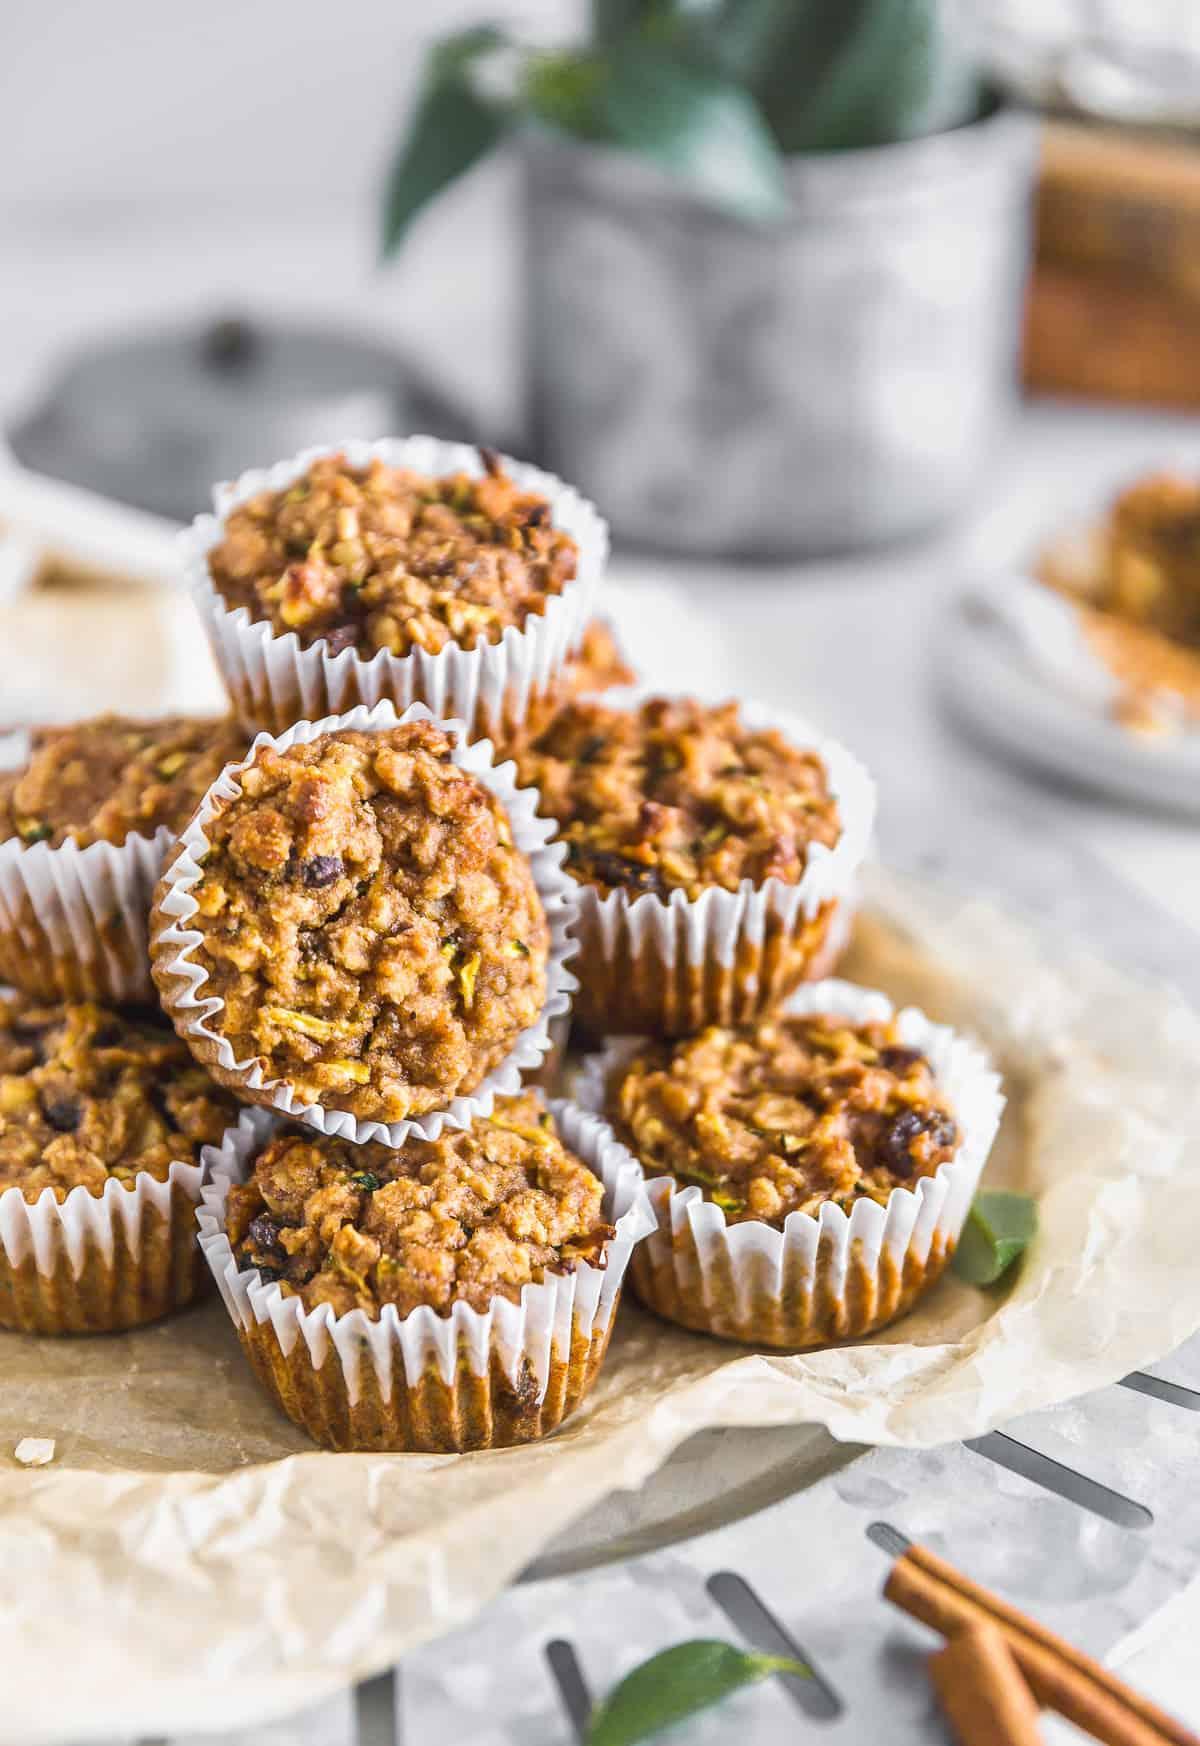 Vegan Zucchini Muffins, zucchini muffins, vegan dessert, muffins, zucchini, dessert, plant based dessert, plant based, vegan, vegetarian, whole food plant based, gluten free, recipe, wfpb, healthy, healthy vegan, oil free, no refined sugar, no oil, refined sugar free, dairy free, sweets, healthy recipe, vegan meal